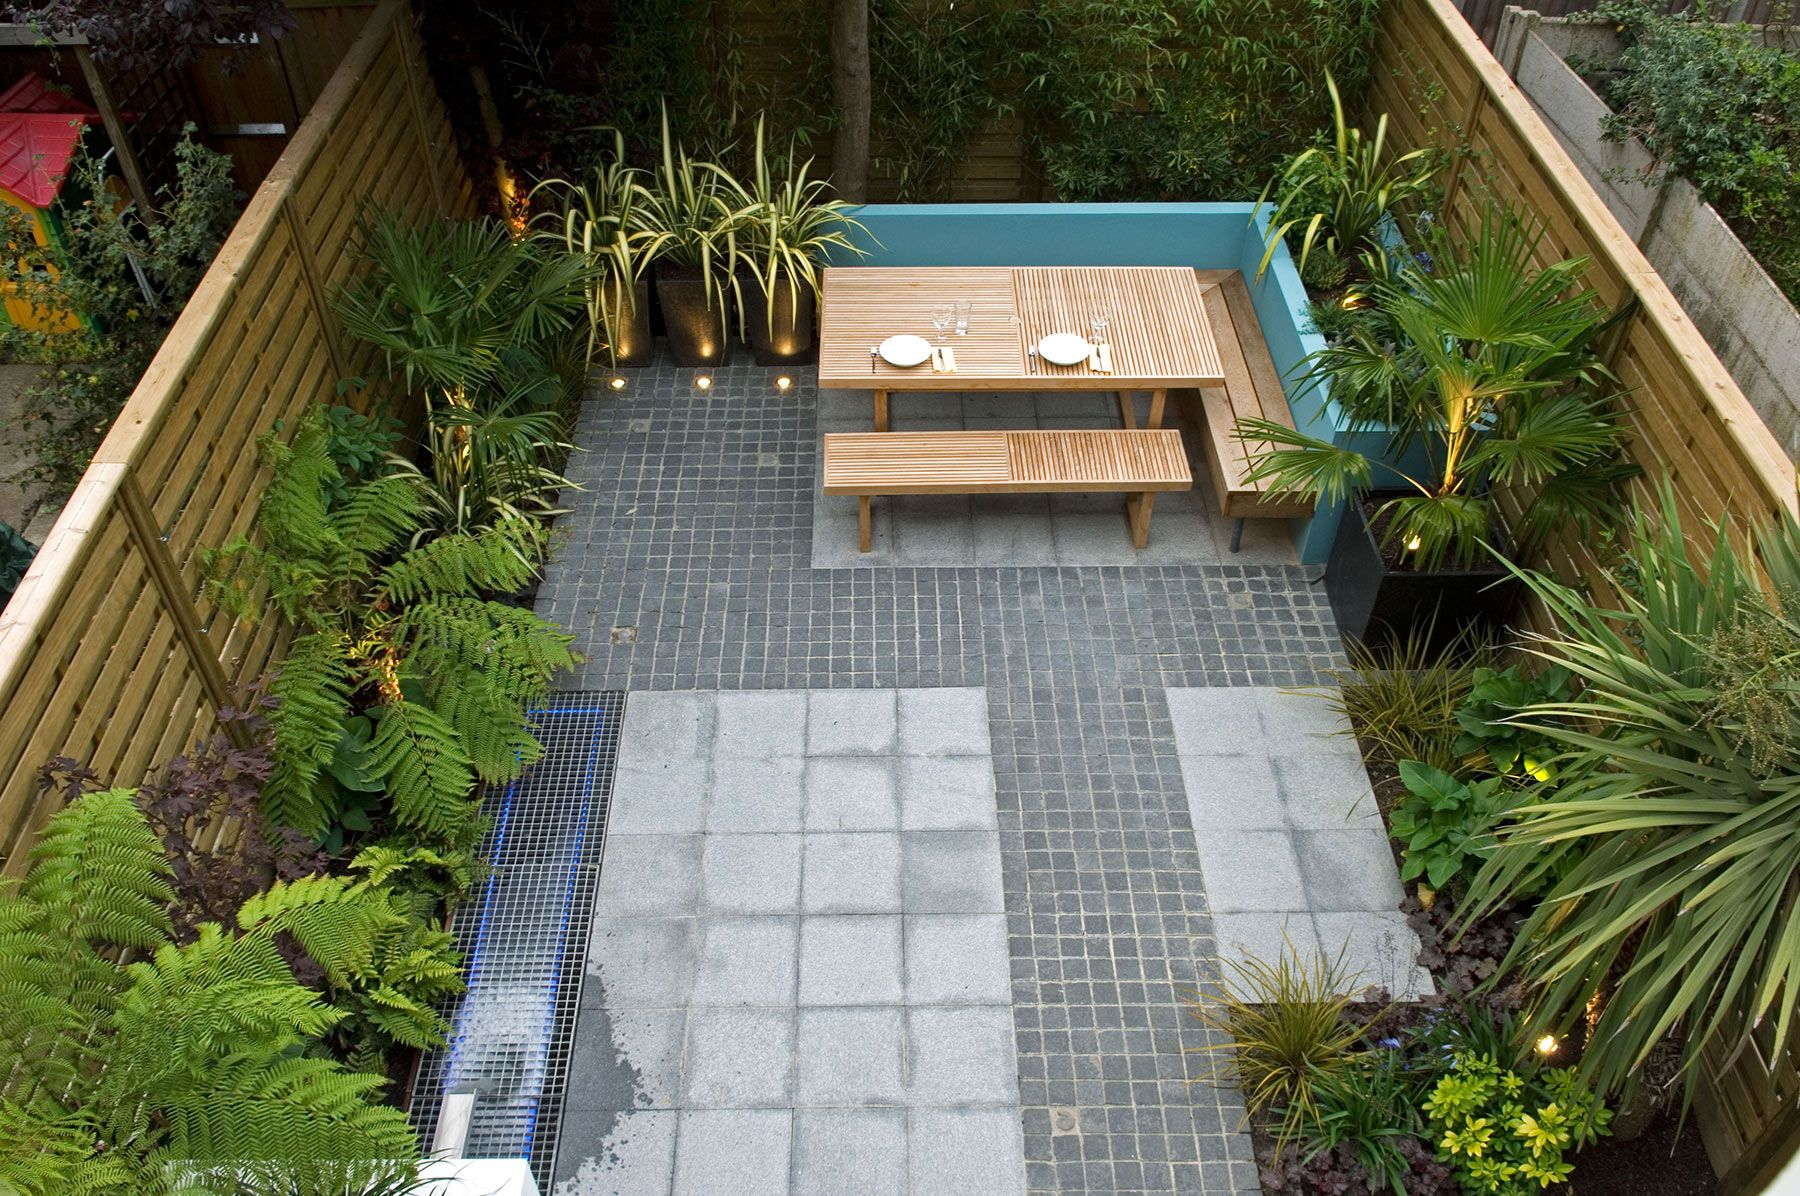 Garden design London Landscapers Wimbledon JARDINES GARDENS